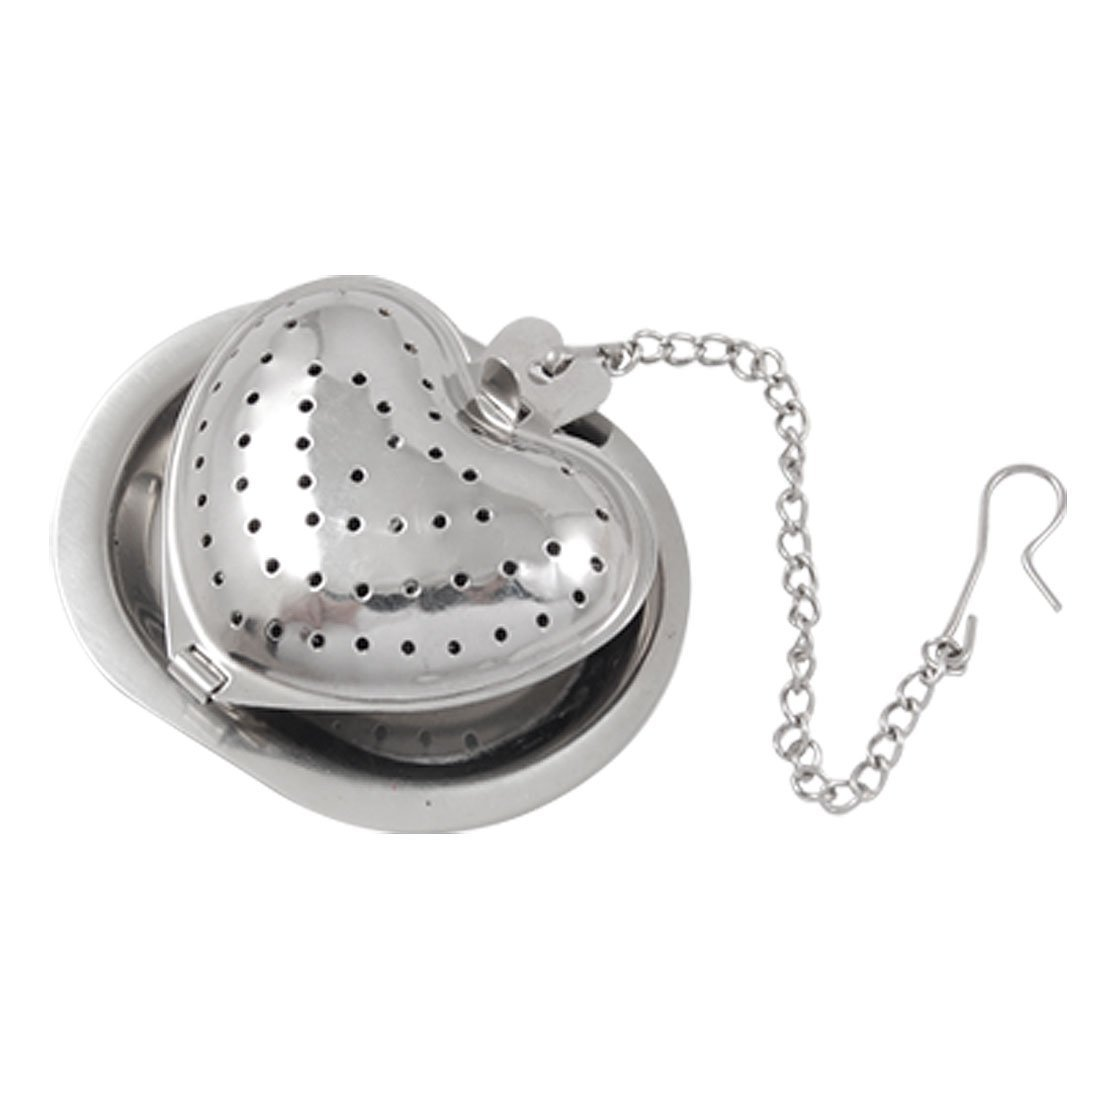 SODIAL(R) Stainless Steel Heart Shaped Tea Infuser Strainer Mesh Ball US-SA-AJD-30114